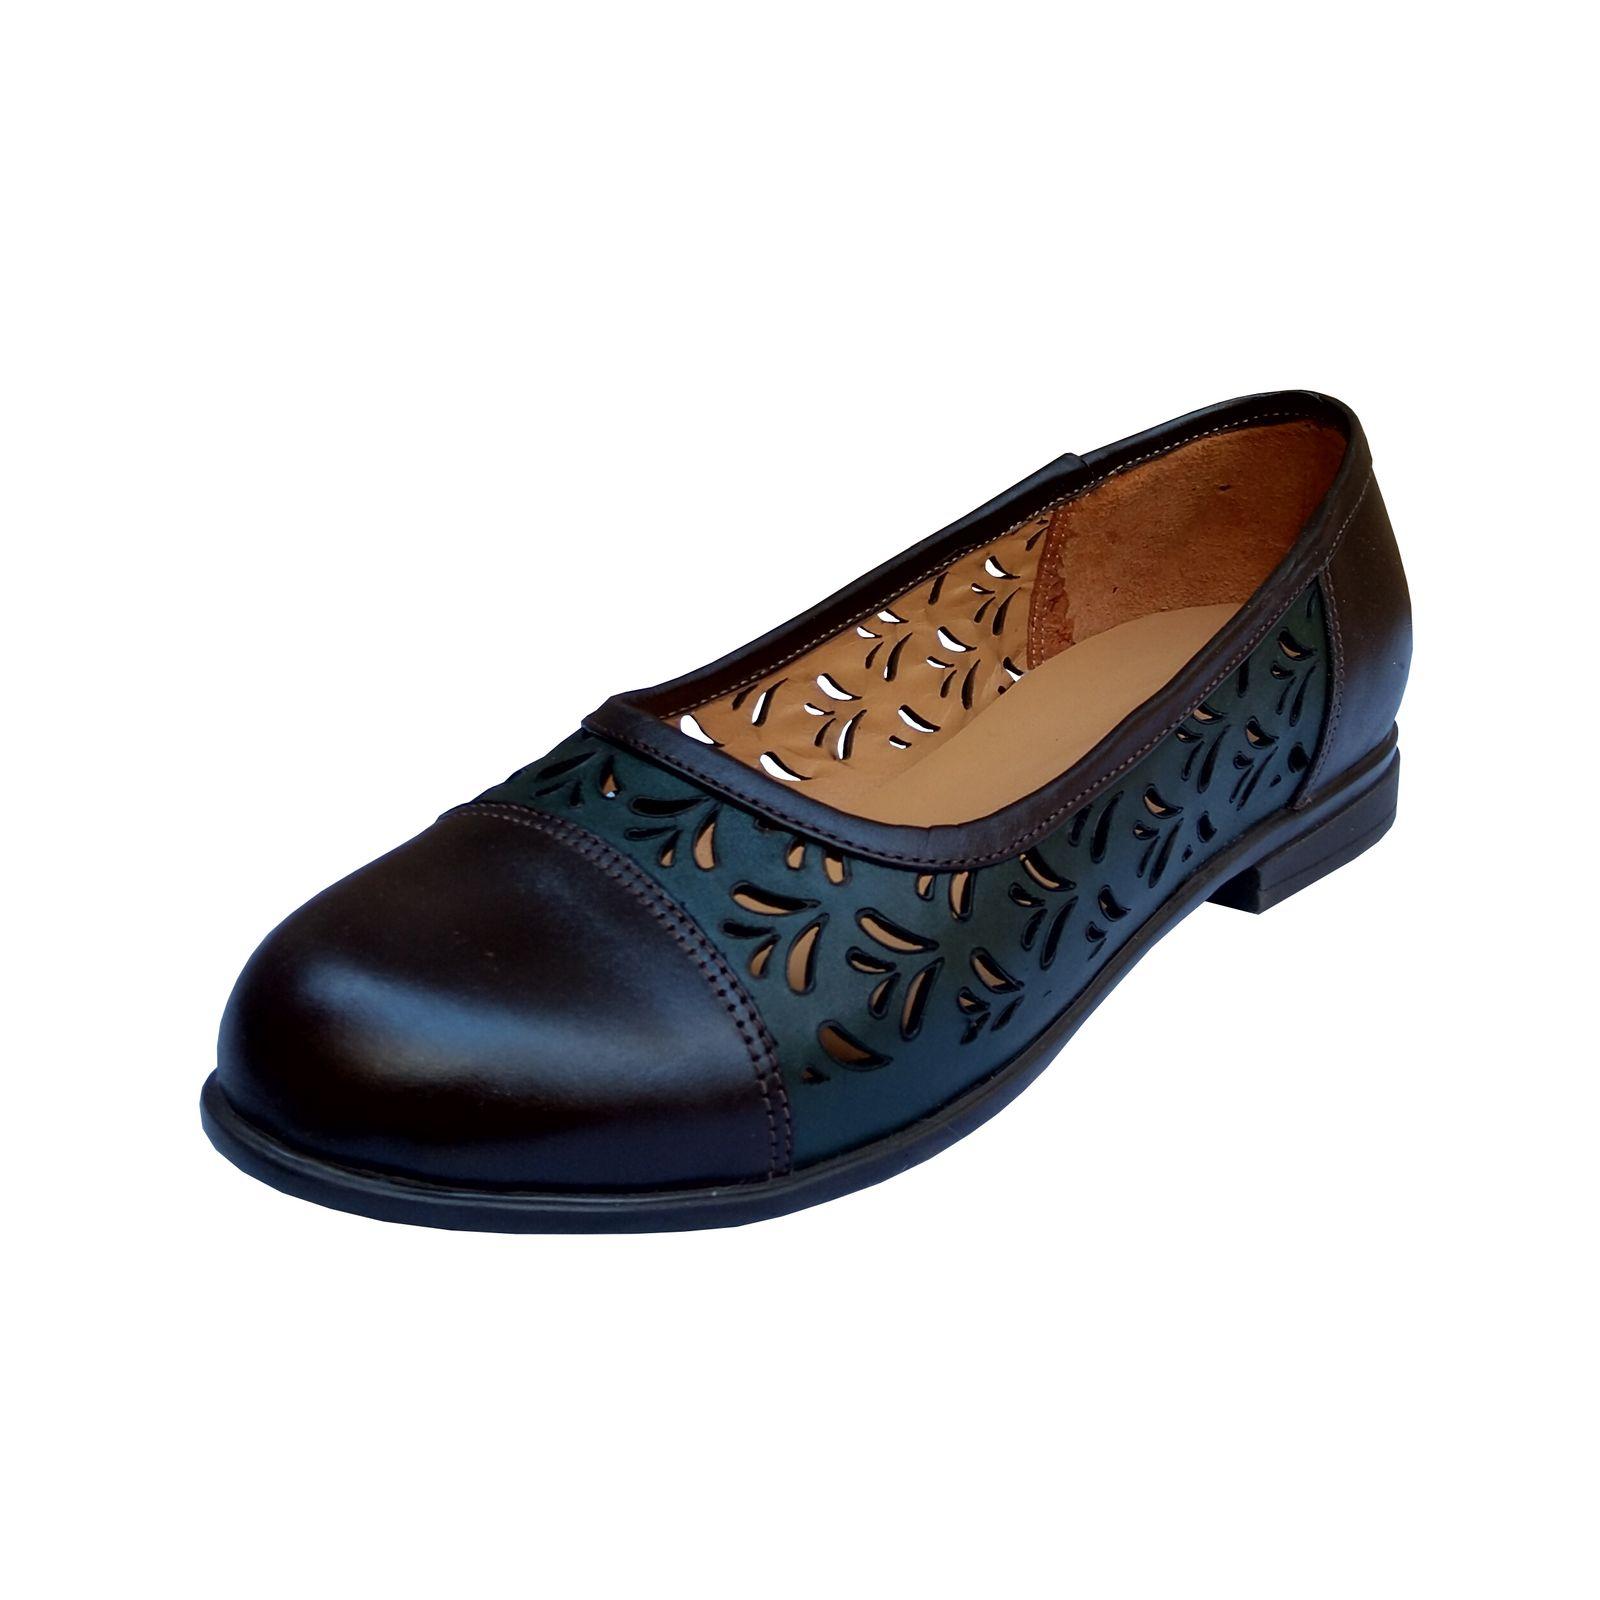 کفش زنانه مدل SK 310 -  - 6